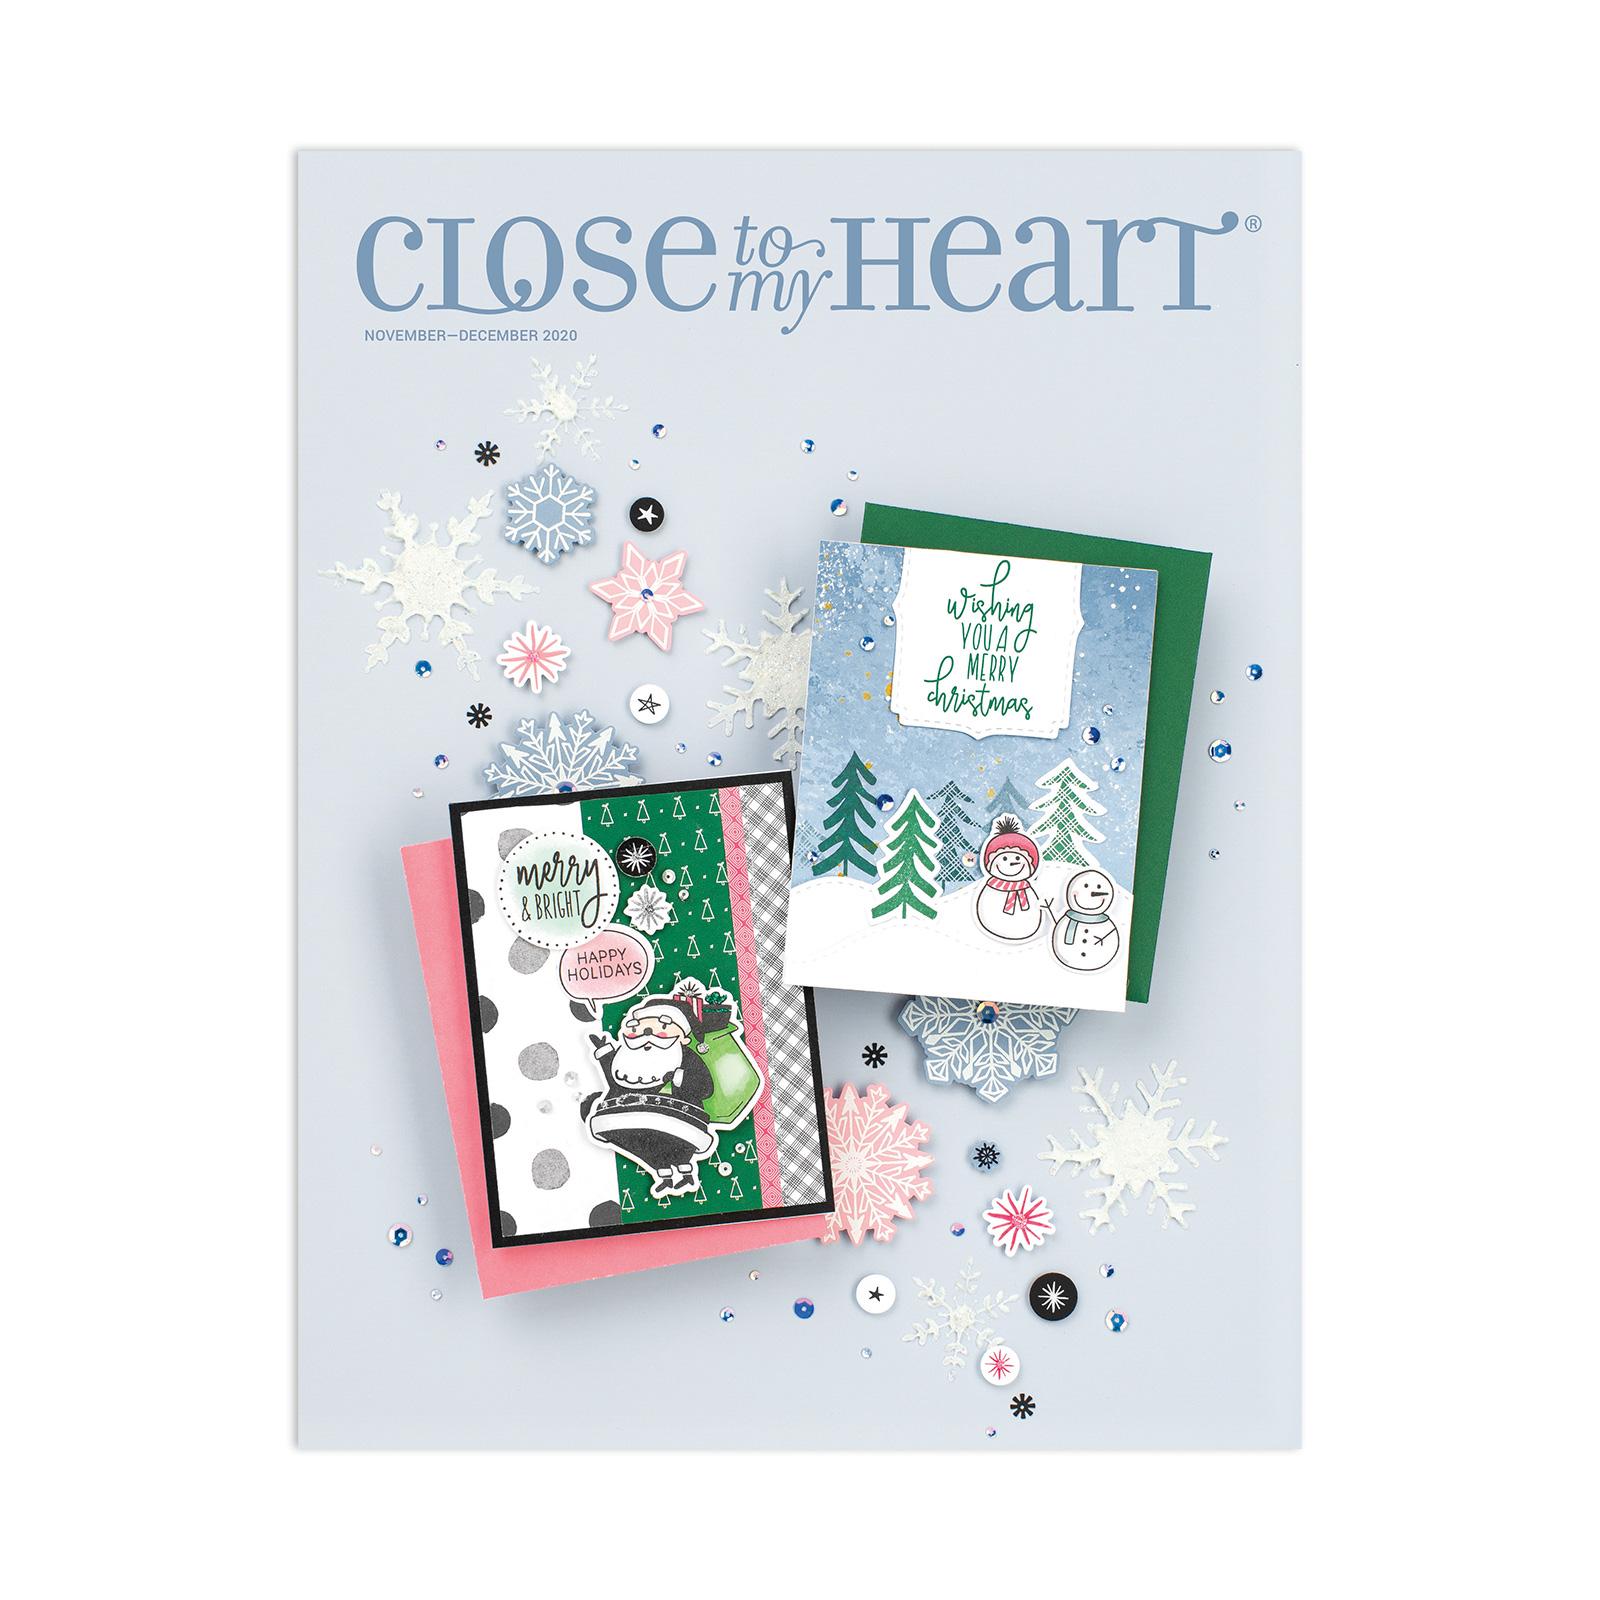 Nov - Dec 2020 Catalogue